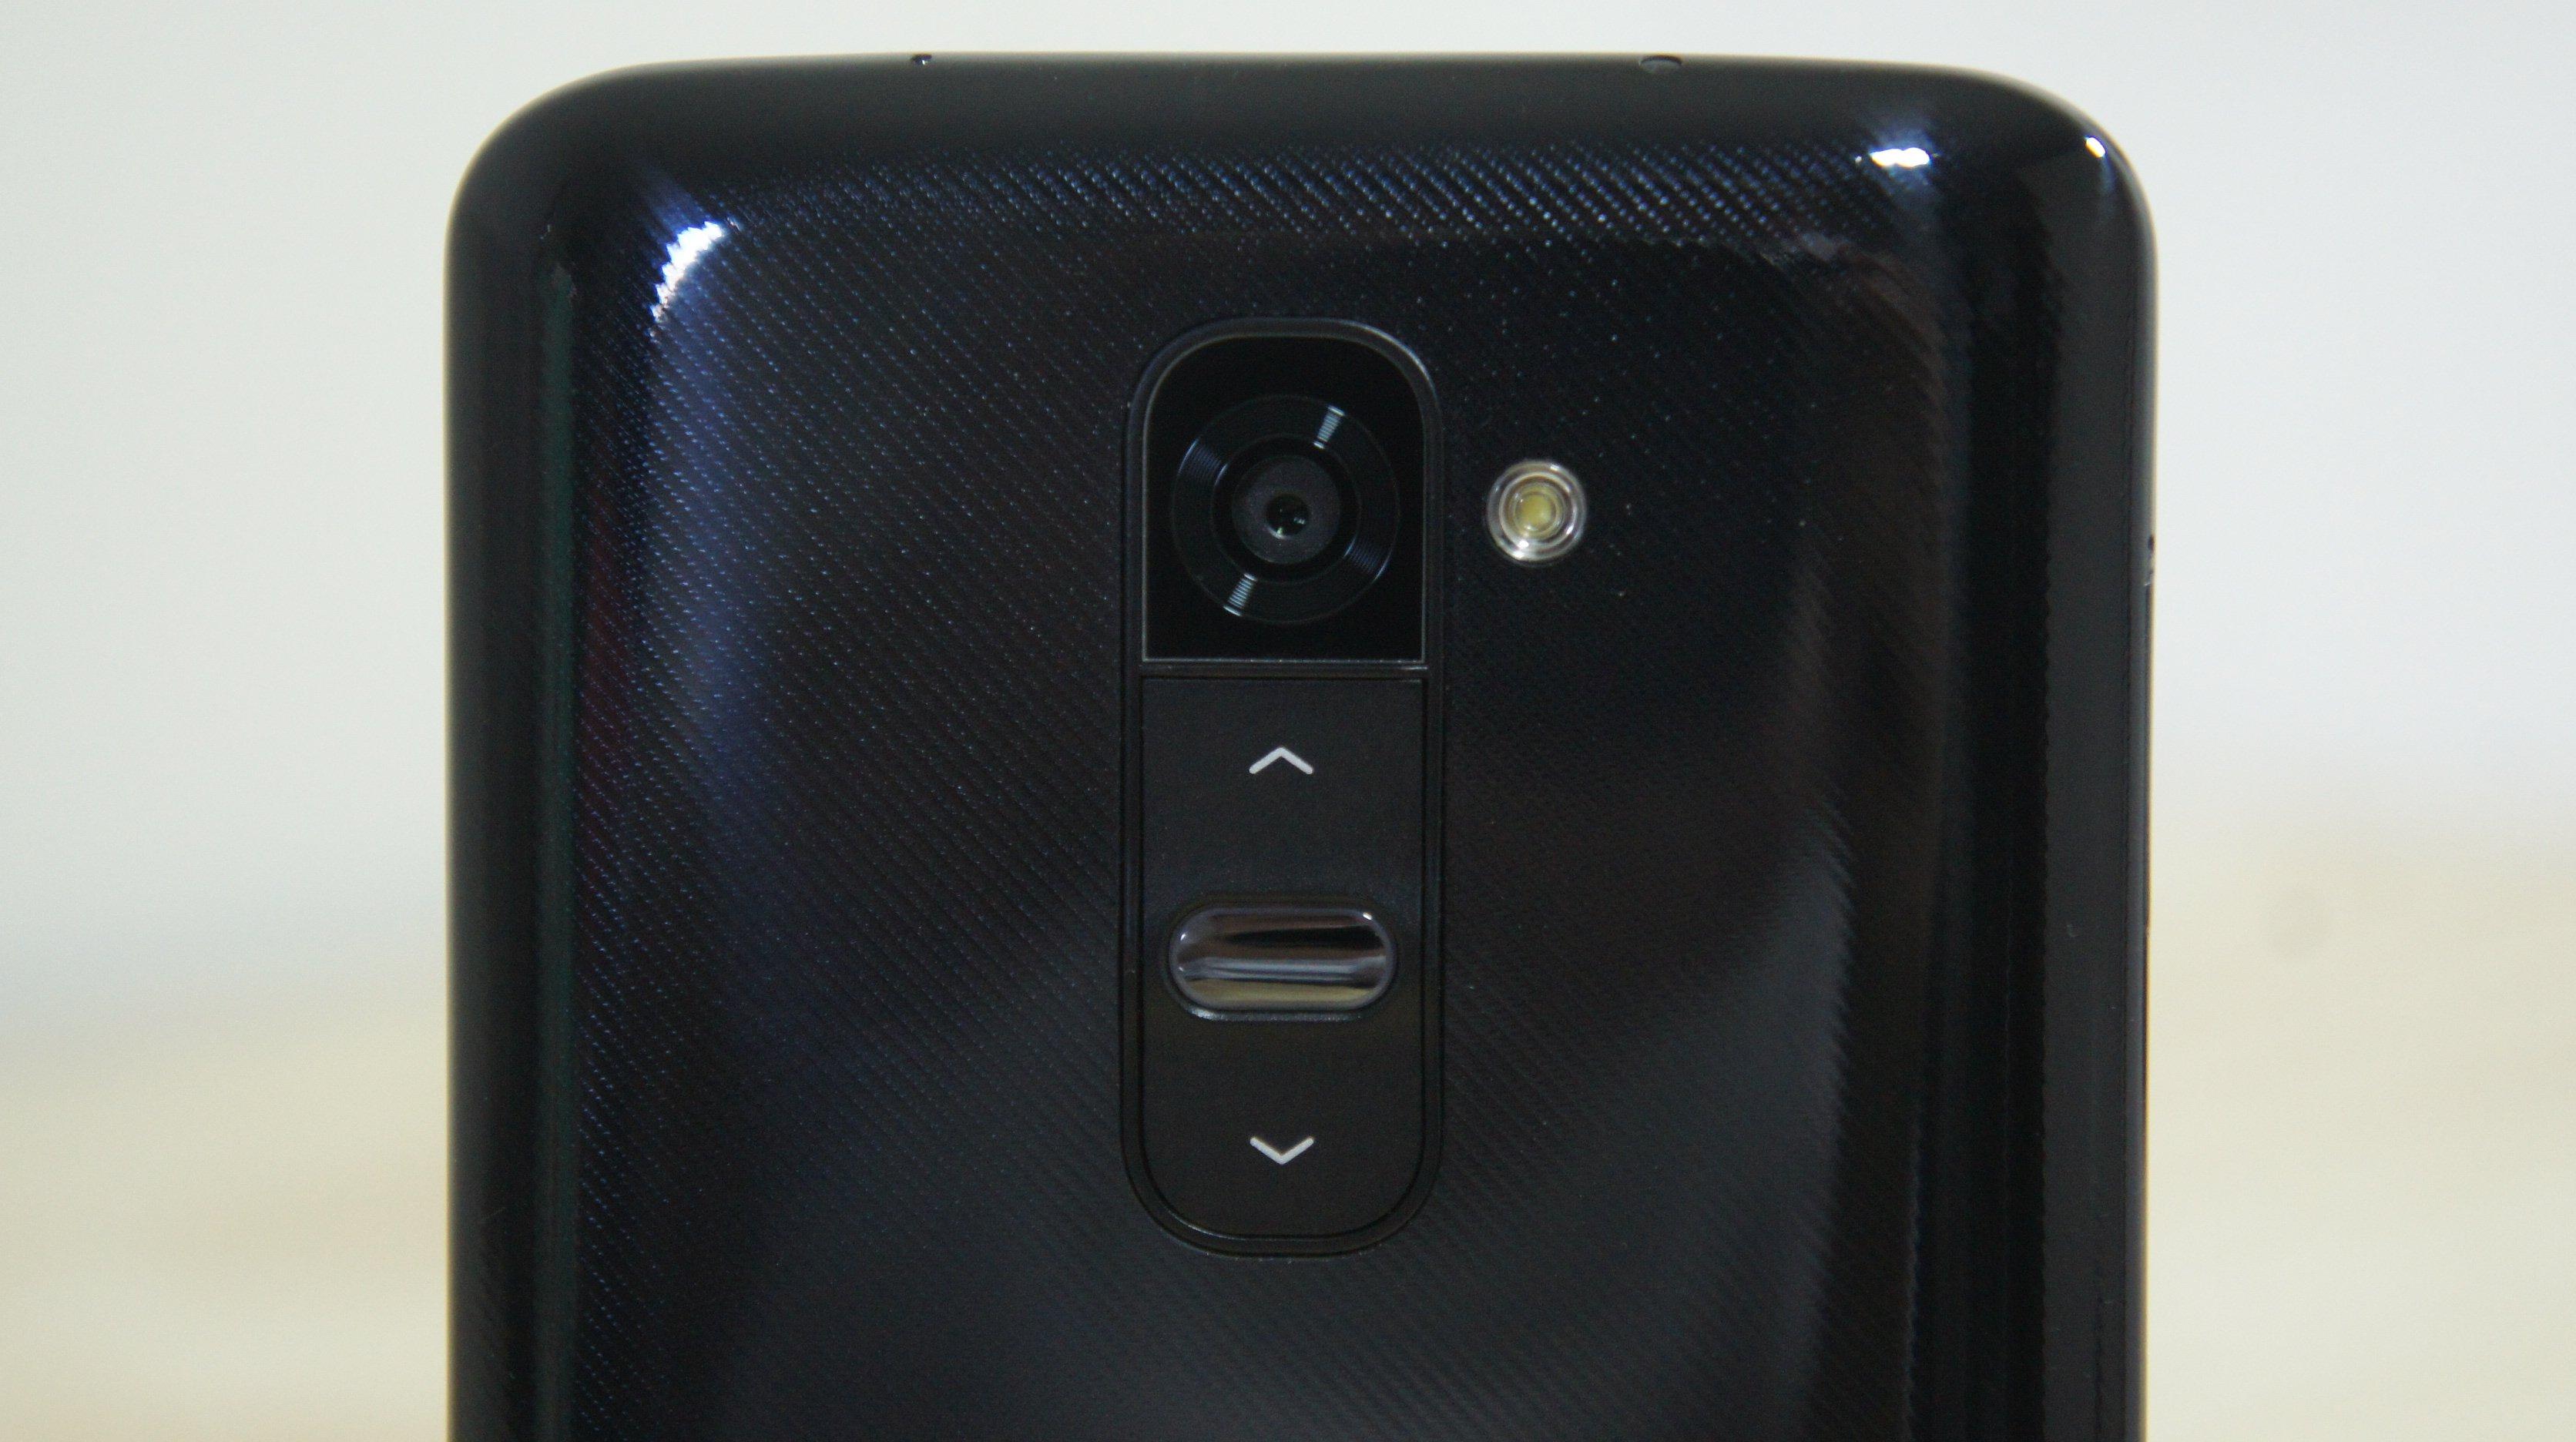 LG G2 Buttons